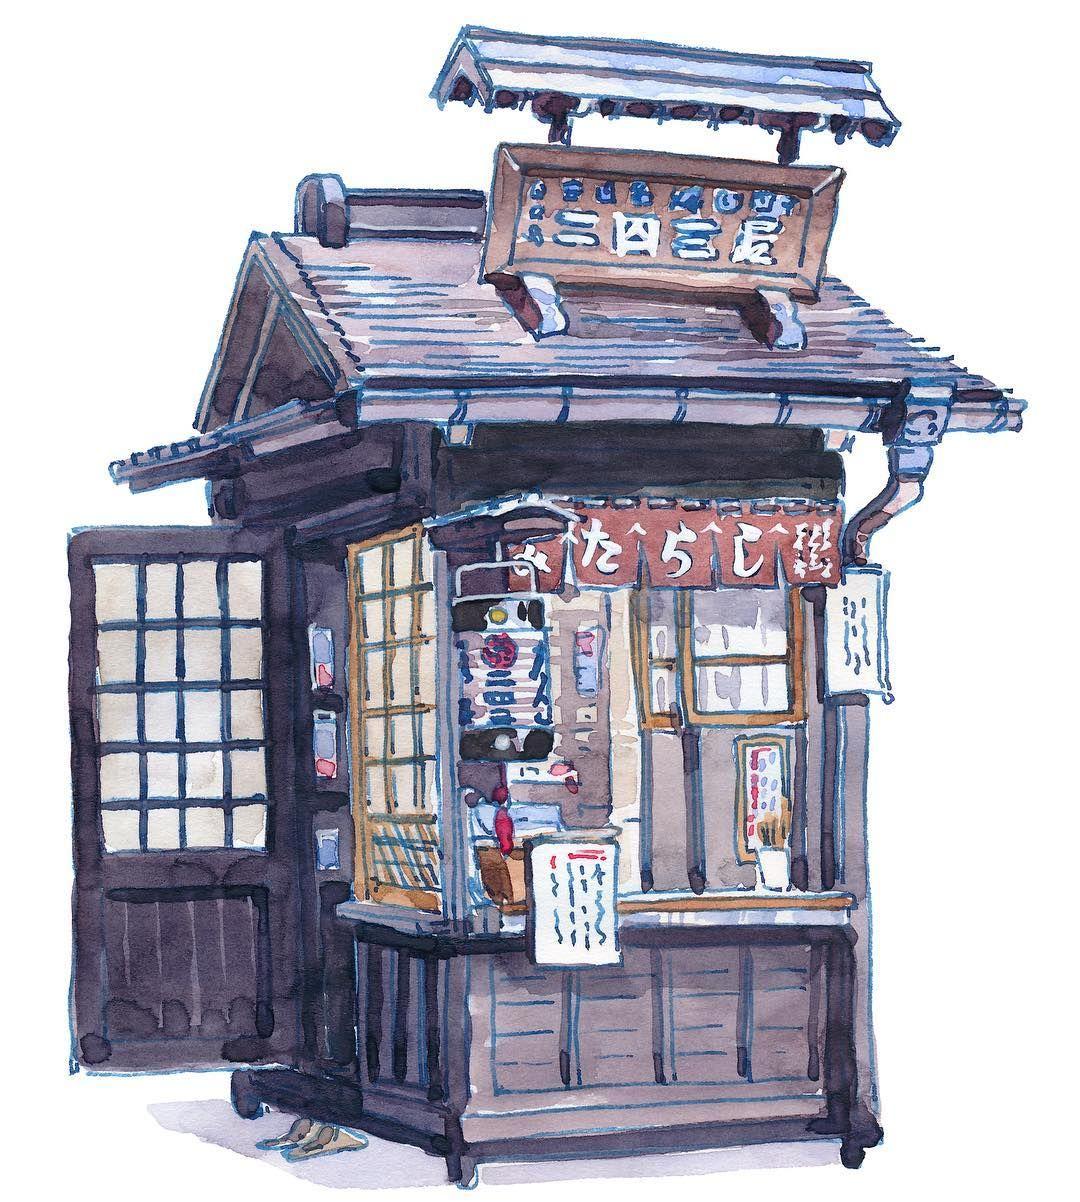 The Mitarashi Dango Stall I Sketched During A Live Youtube Stream